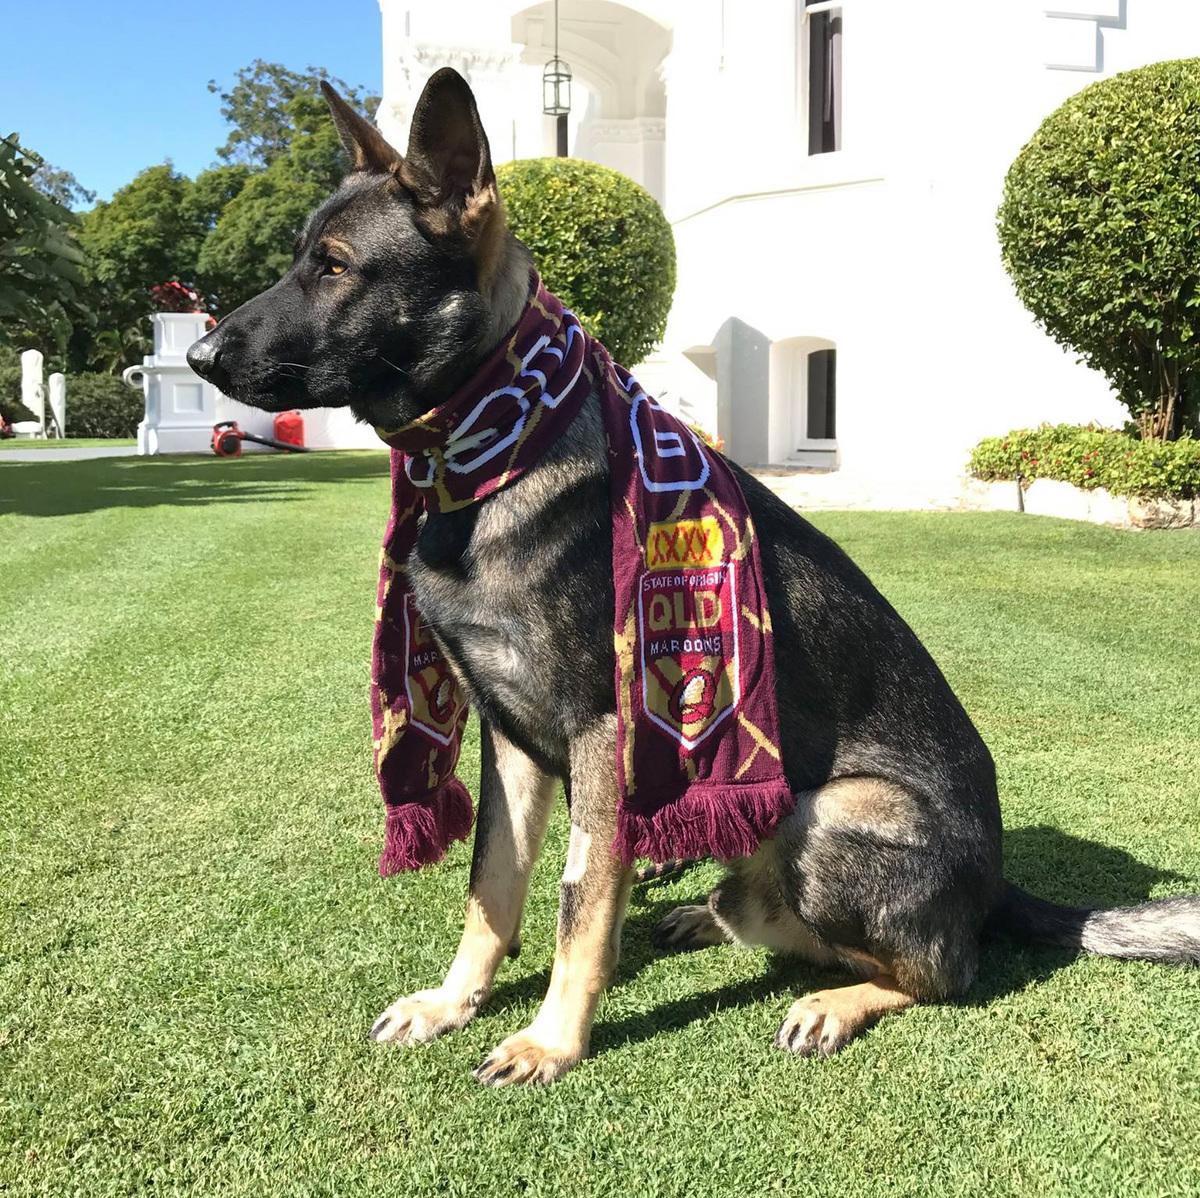 Gavel wearing a queensland maroons scarf